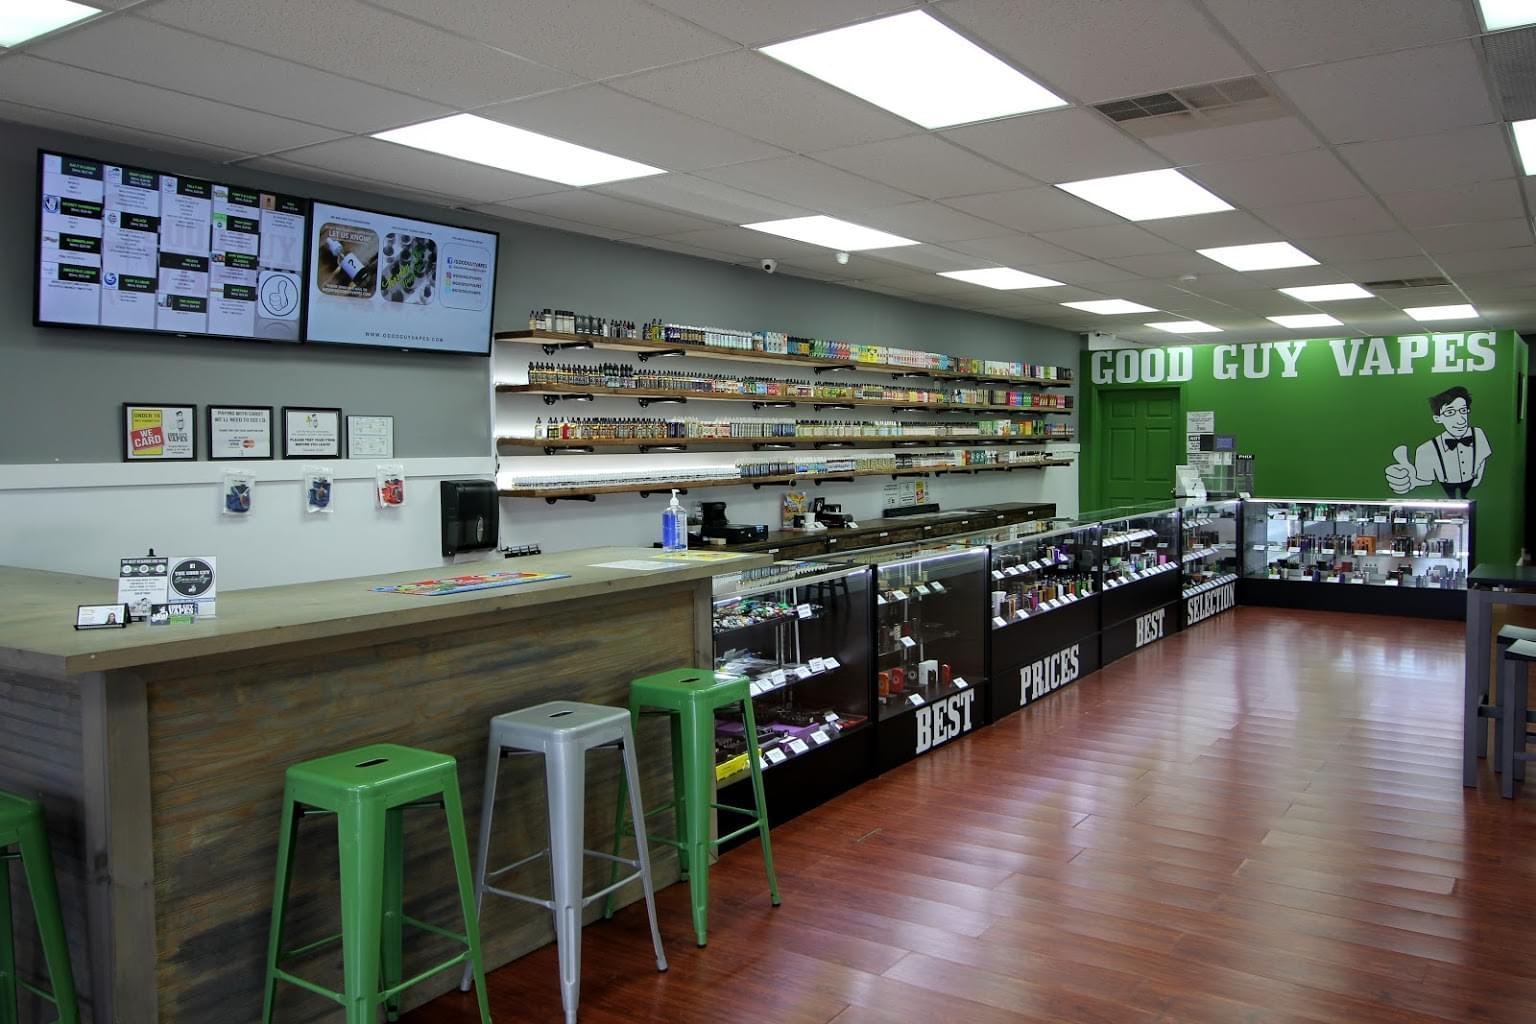 Good Guy Vapes – Rockaway, NJ – See-Inside Vaporizer Store